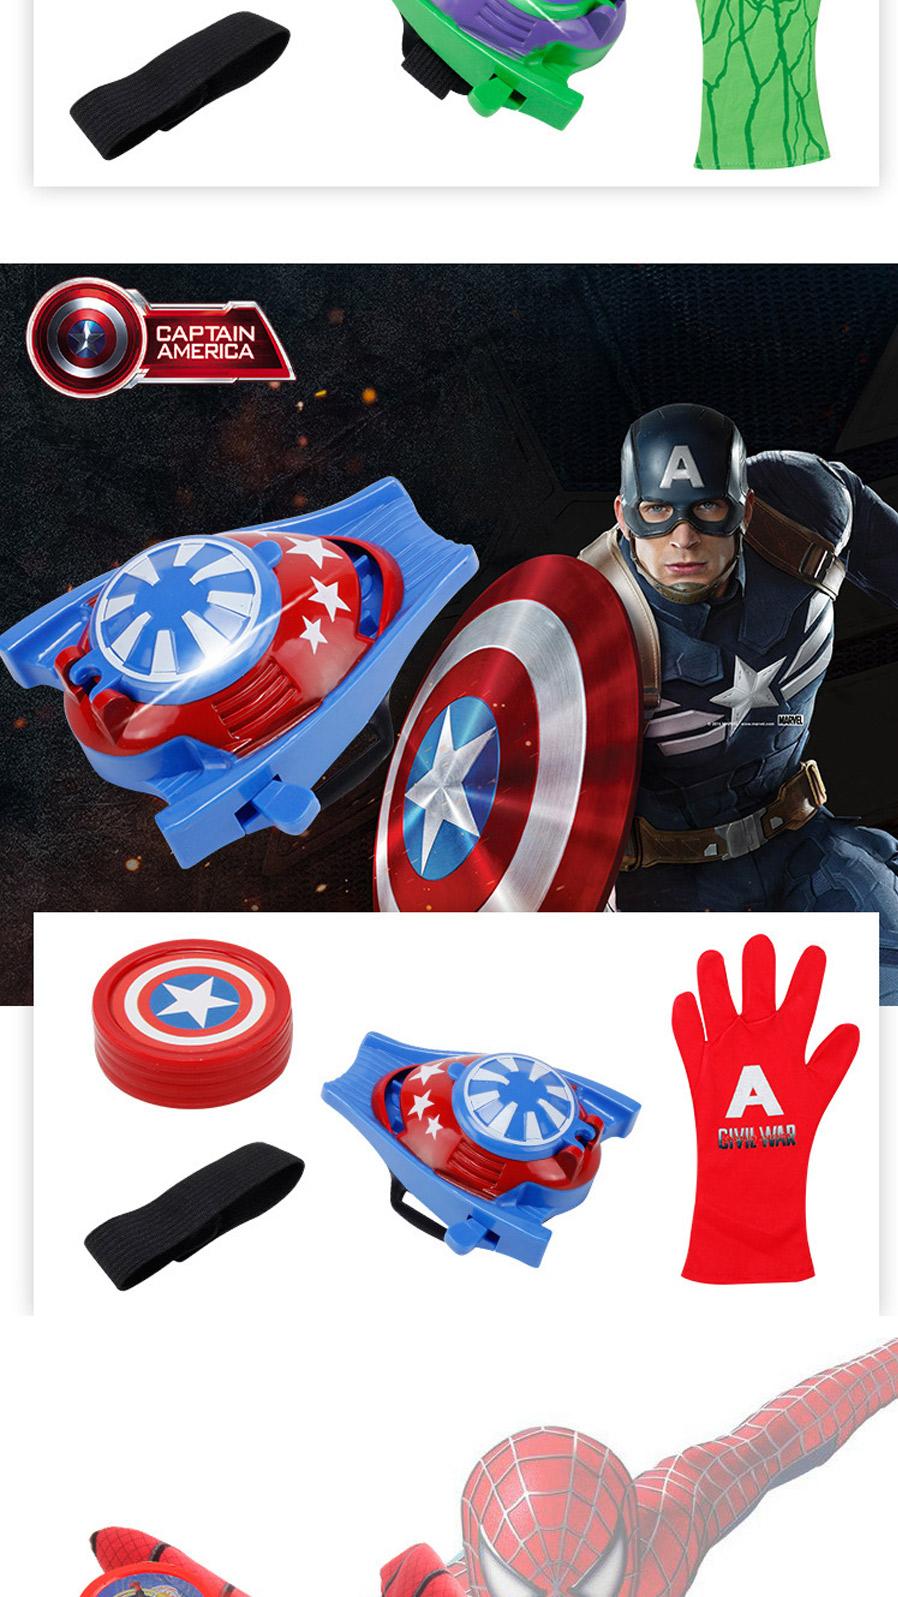 Toys & Hobbies Hot Marvel Avengers Super Heroes Glove Laucher Props Spiderman Batman Hulk Iron Man Cosplay Cool Gift Glove Launcher For Kid